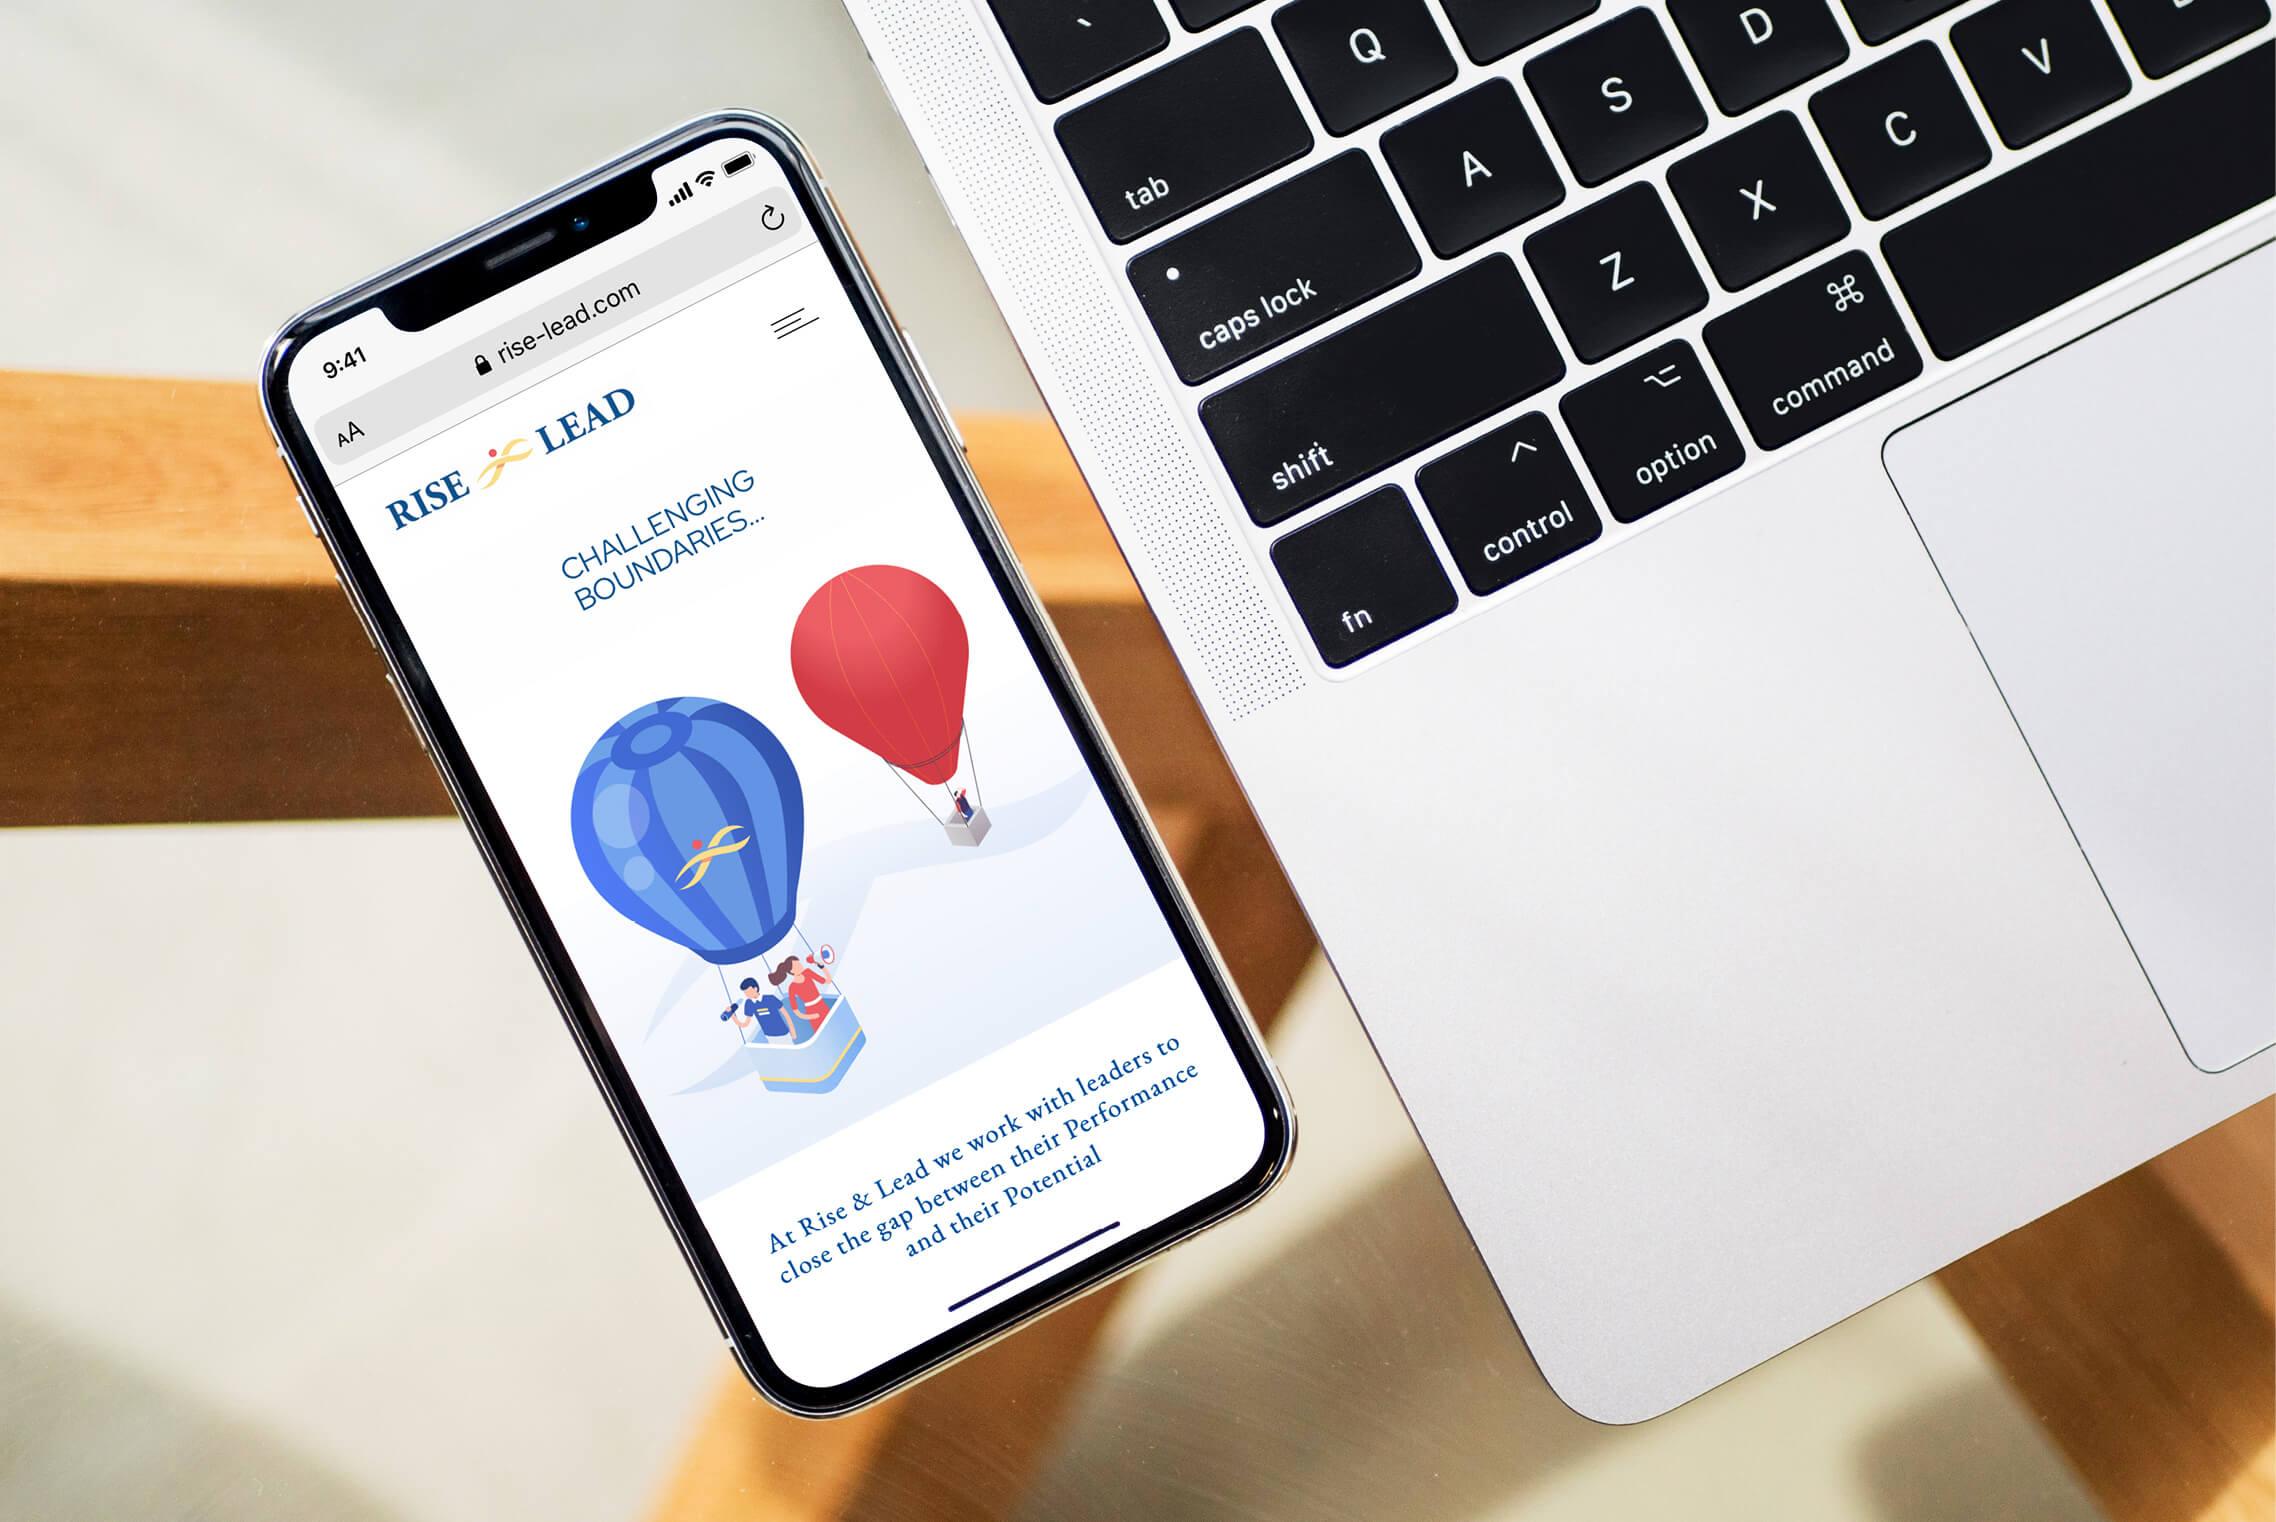 Rise & Lead Mobile website